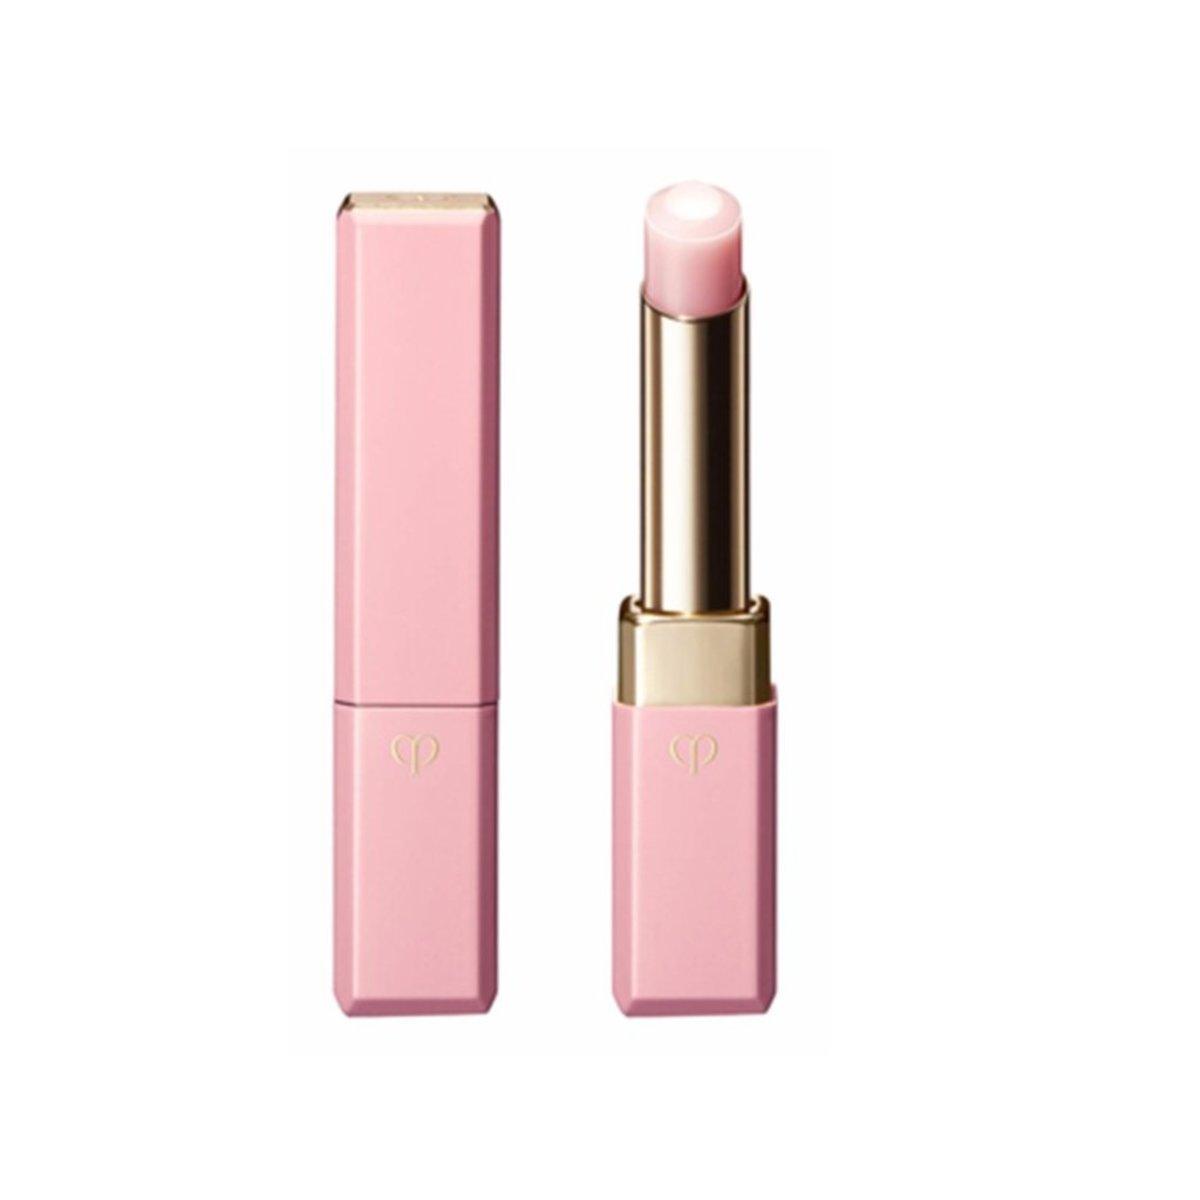 Lip Glorifier N 2.8g #1 Pink [Parallel Import Product]